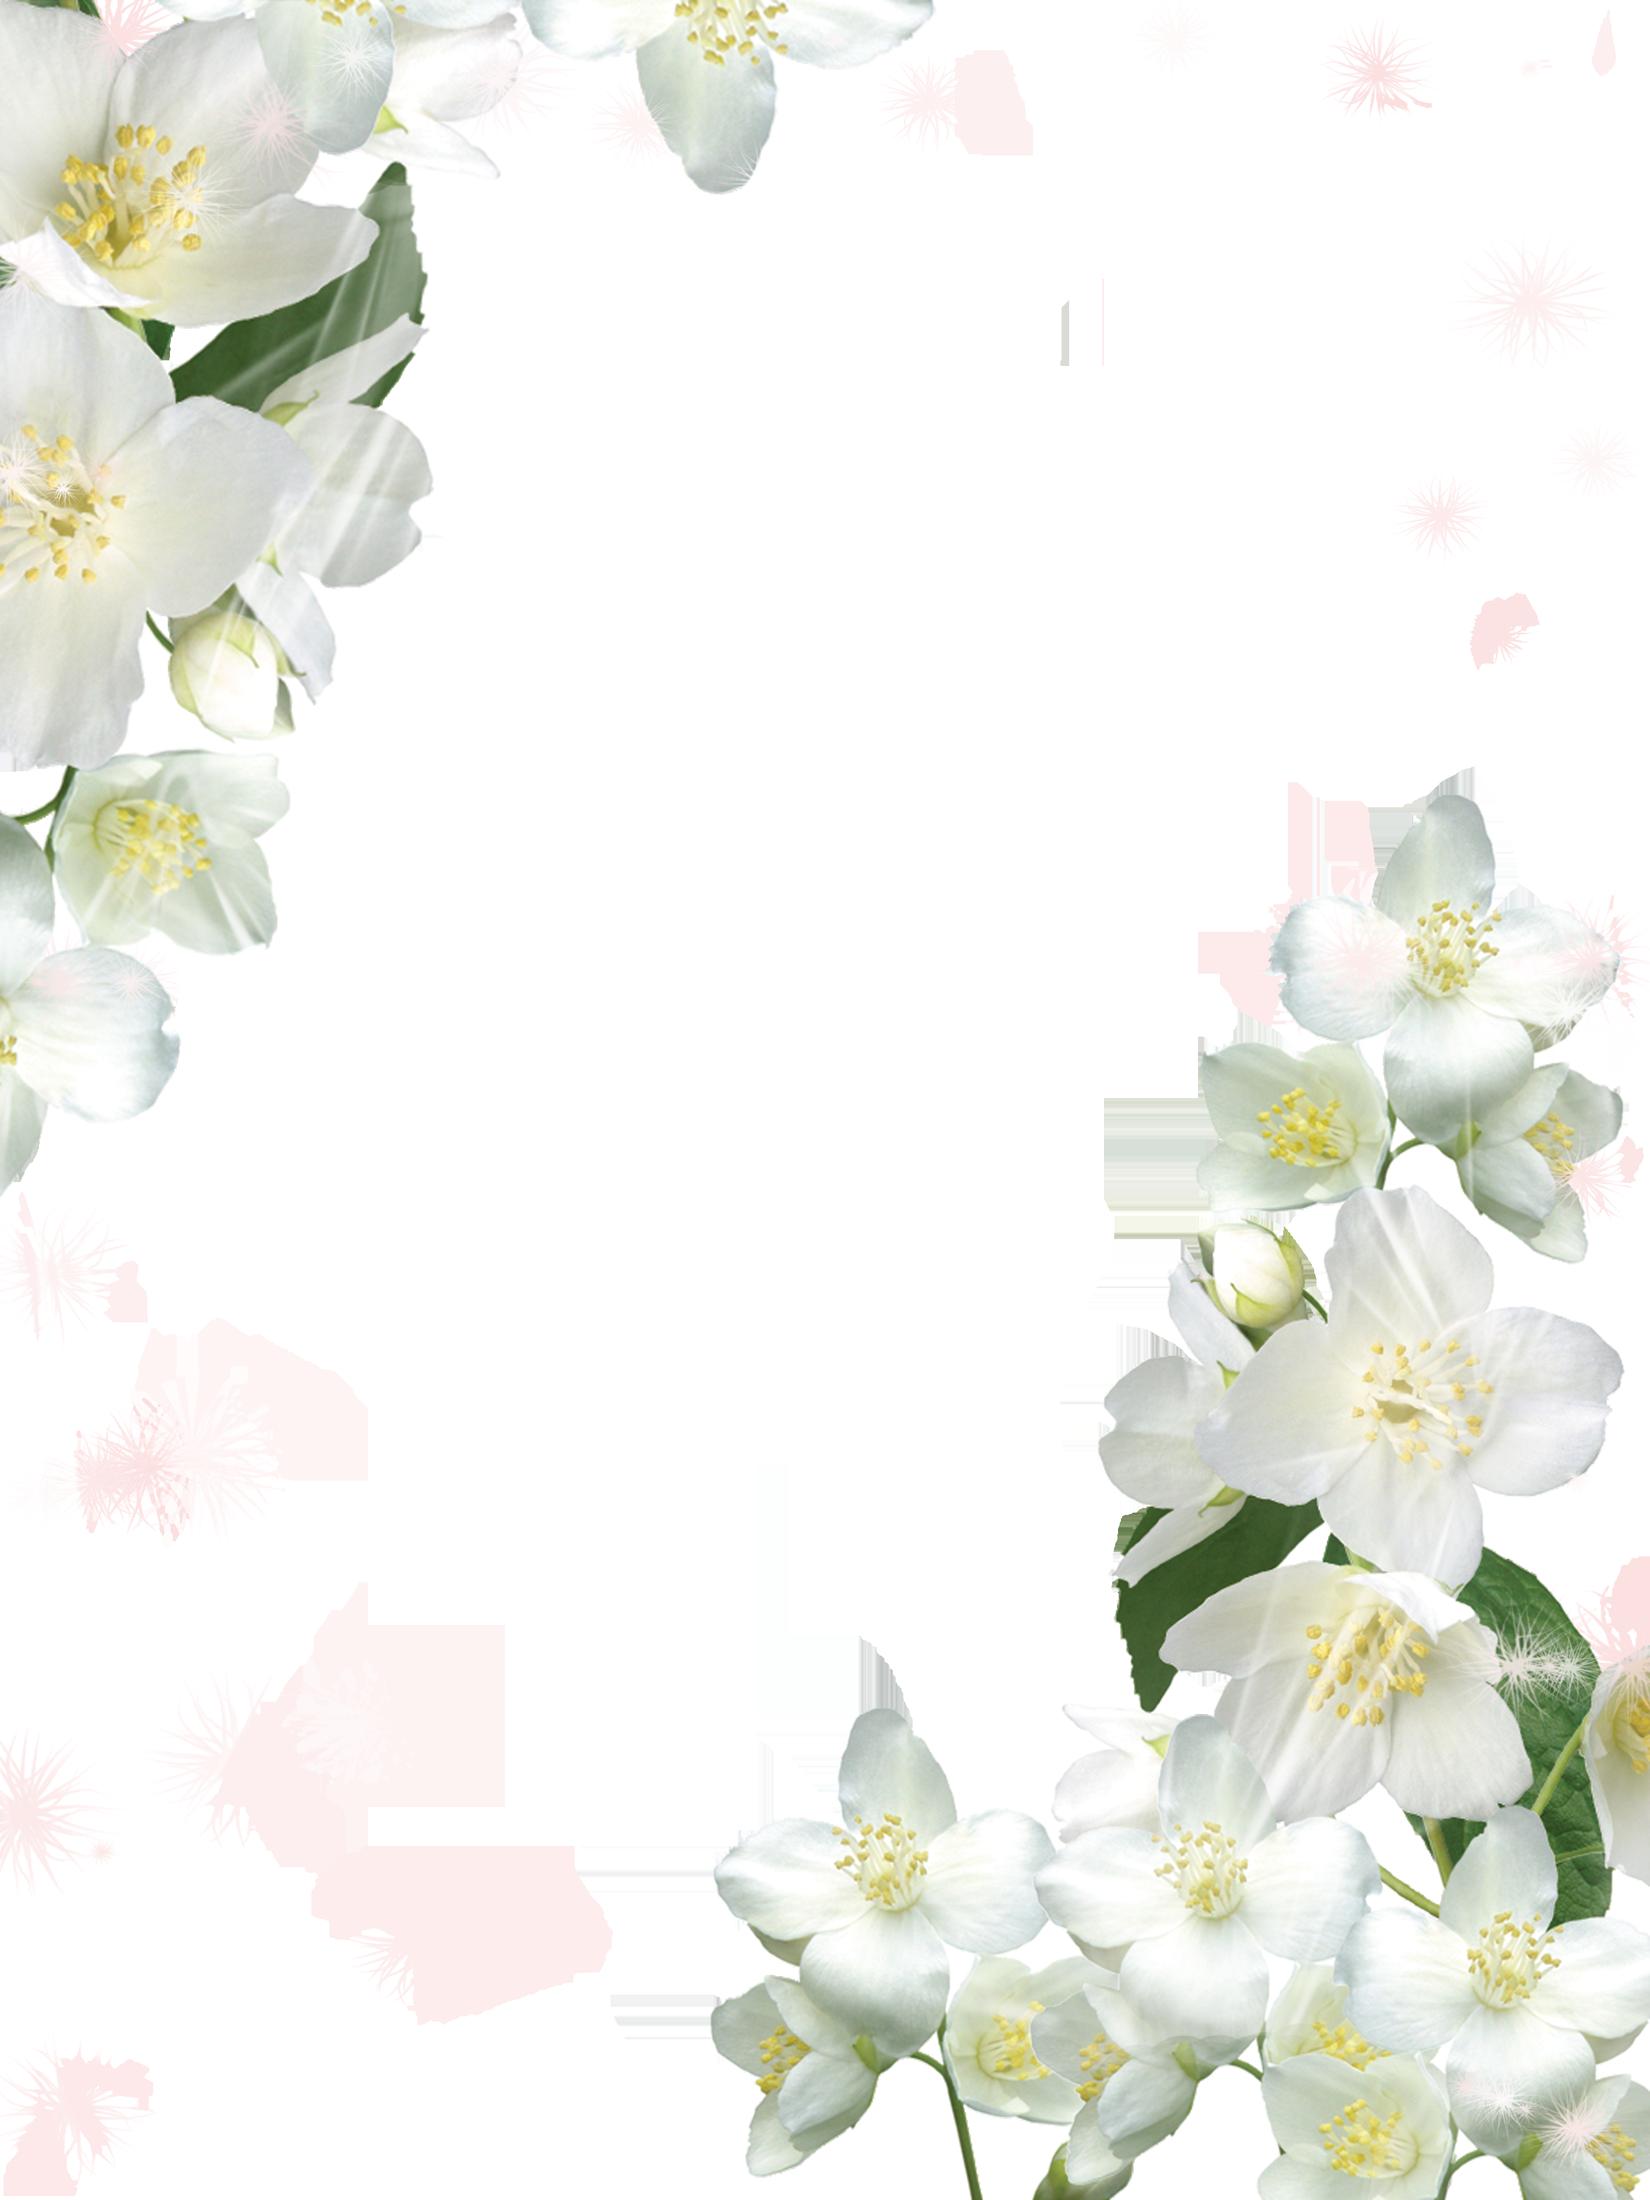 Lily clipart blue jasmine. Transparent white photo frame